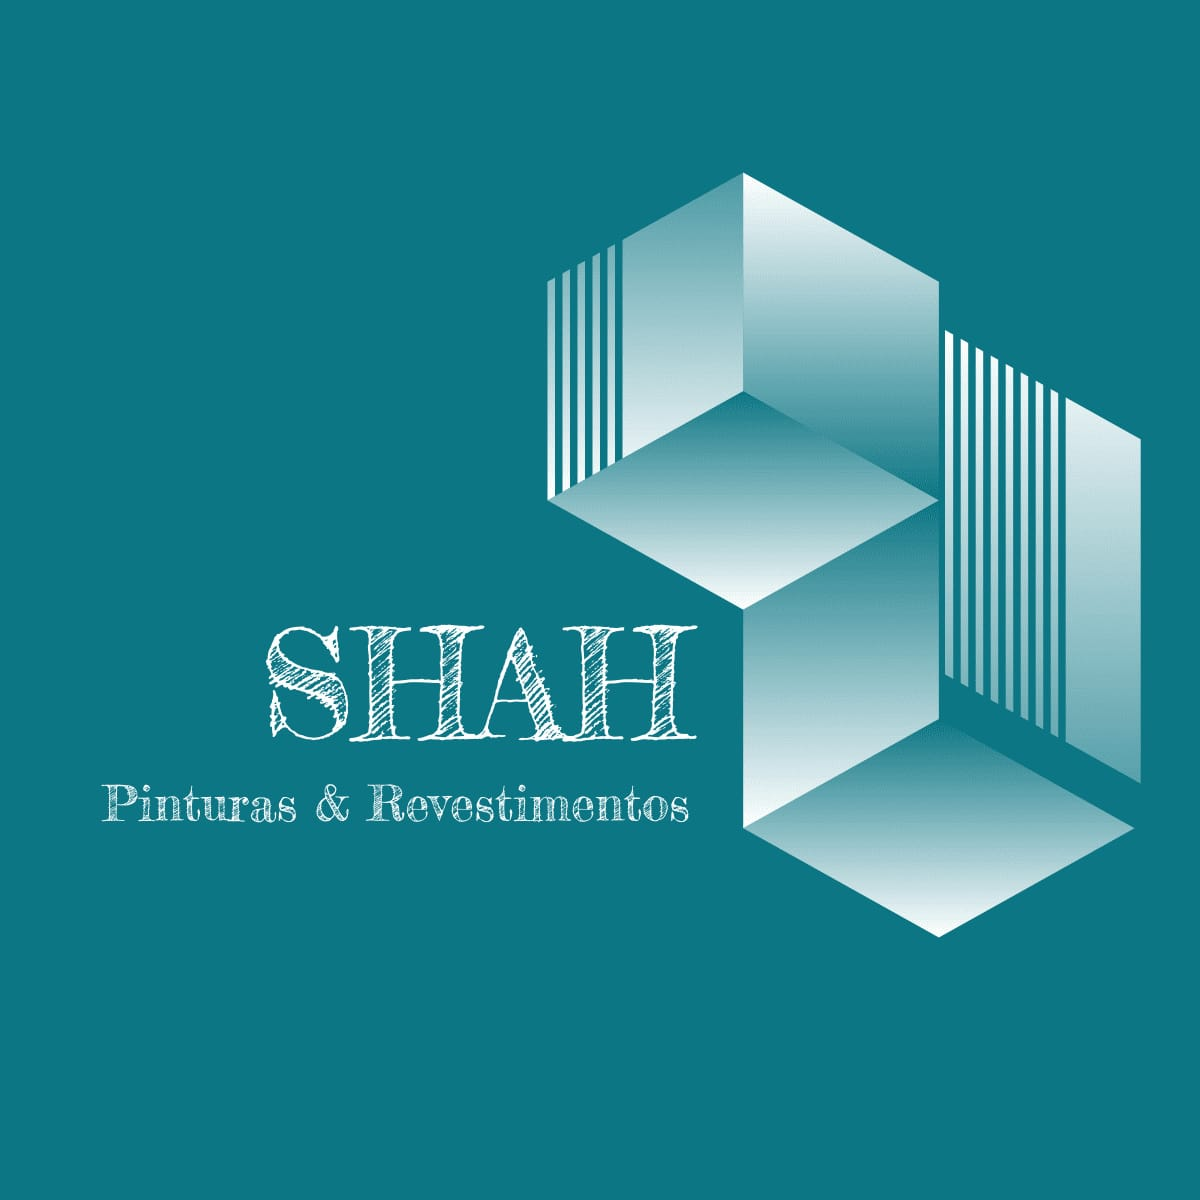 Shah Pinturas